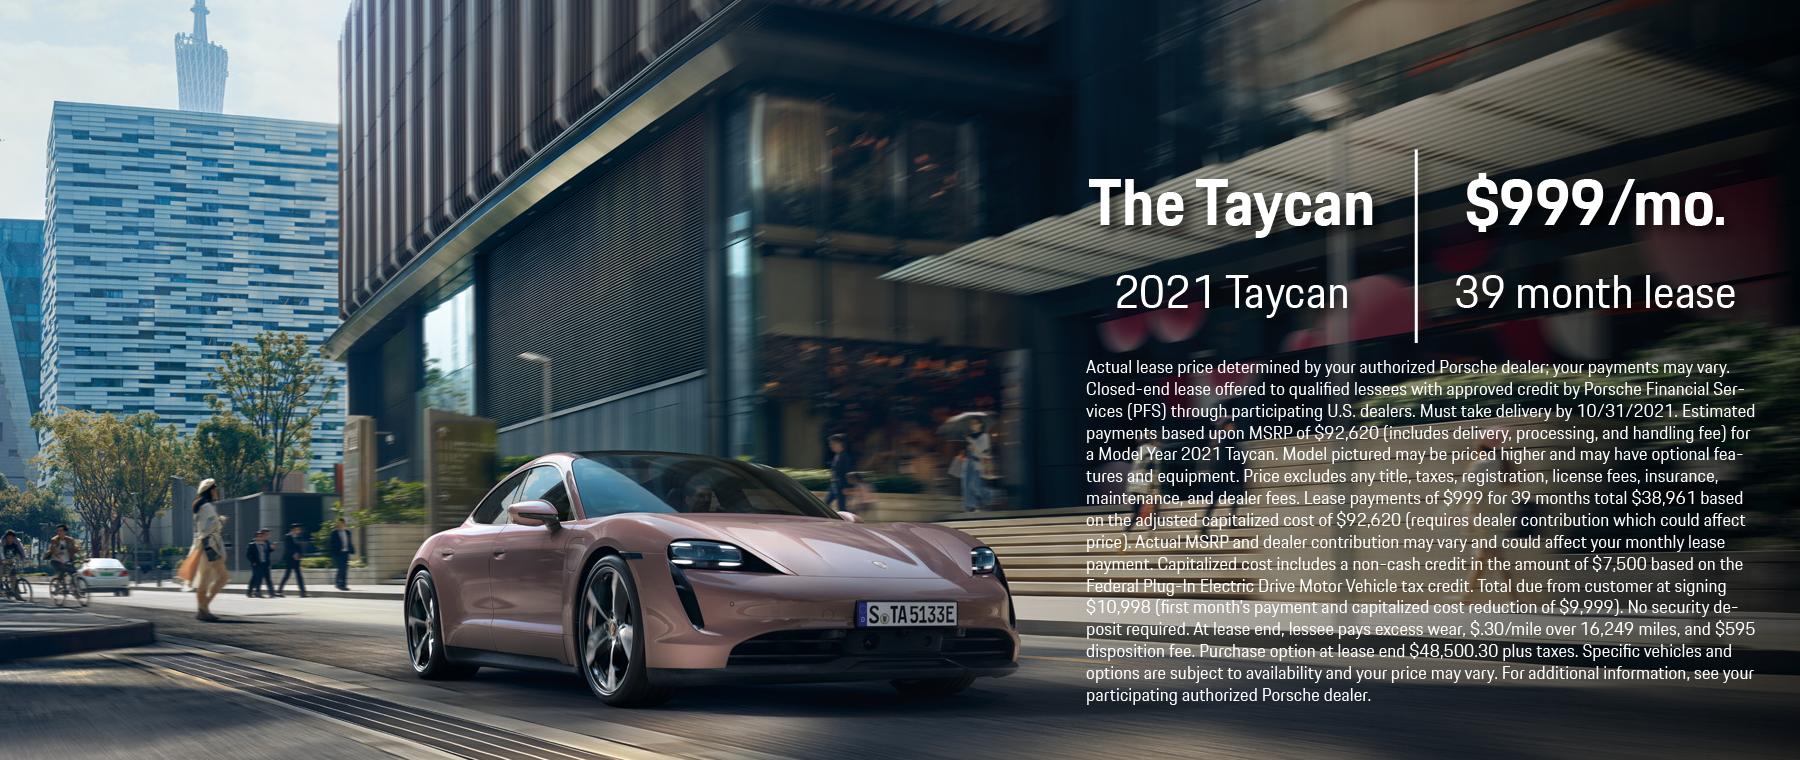 2021 Taycan